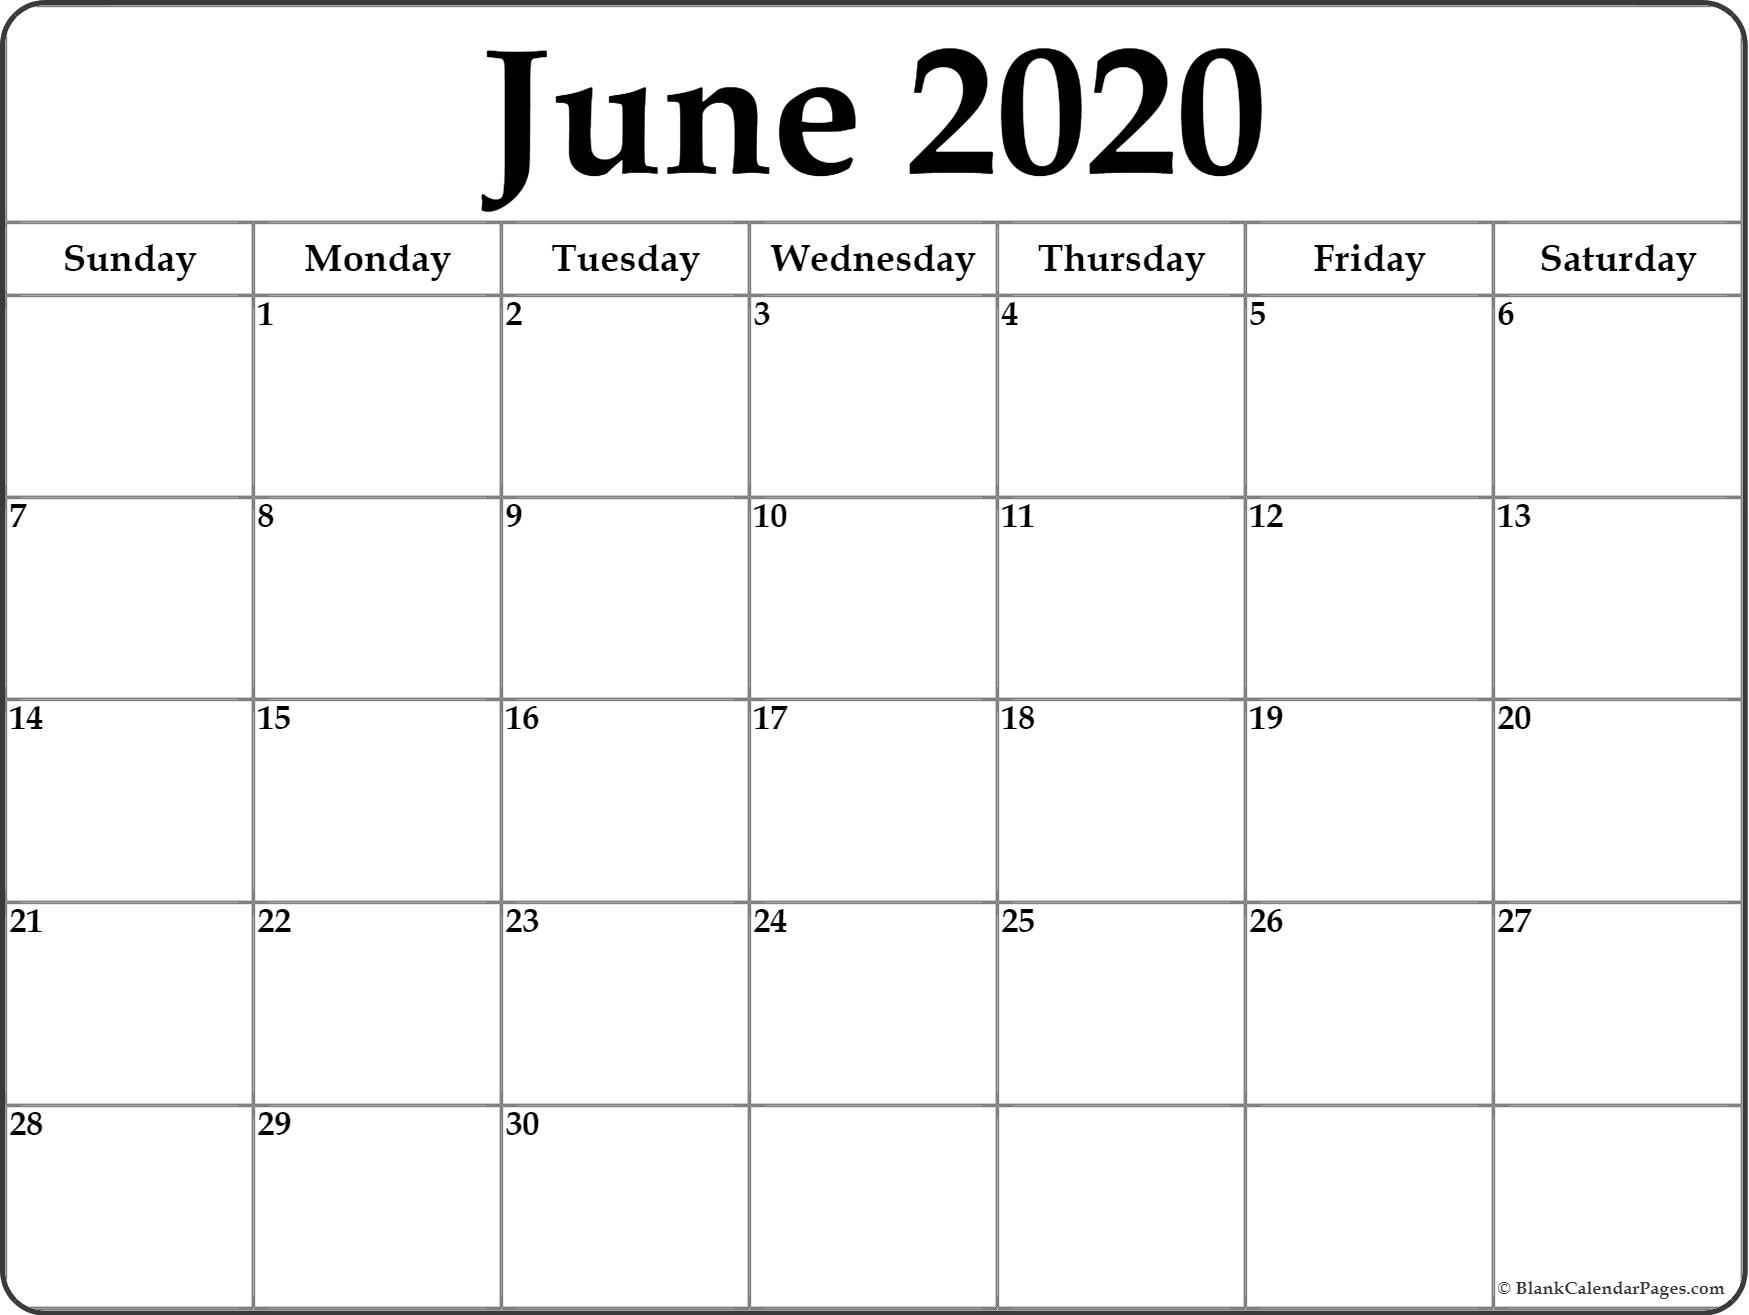 005 Top June 2020 Monthly Calendar Template Inspiration Full